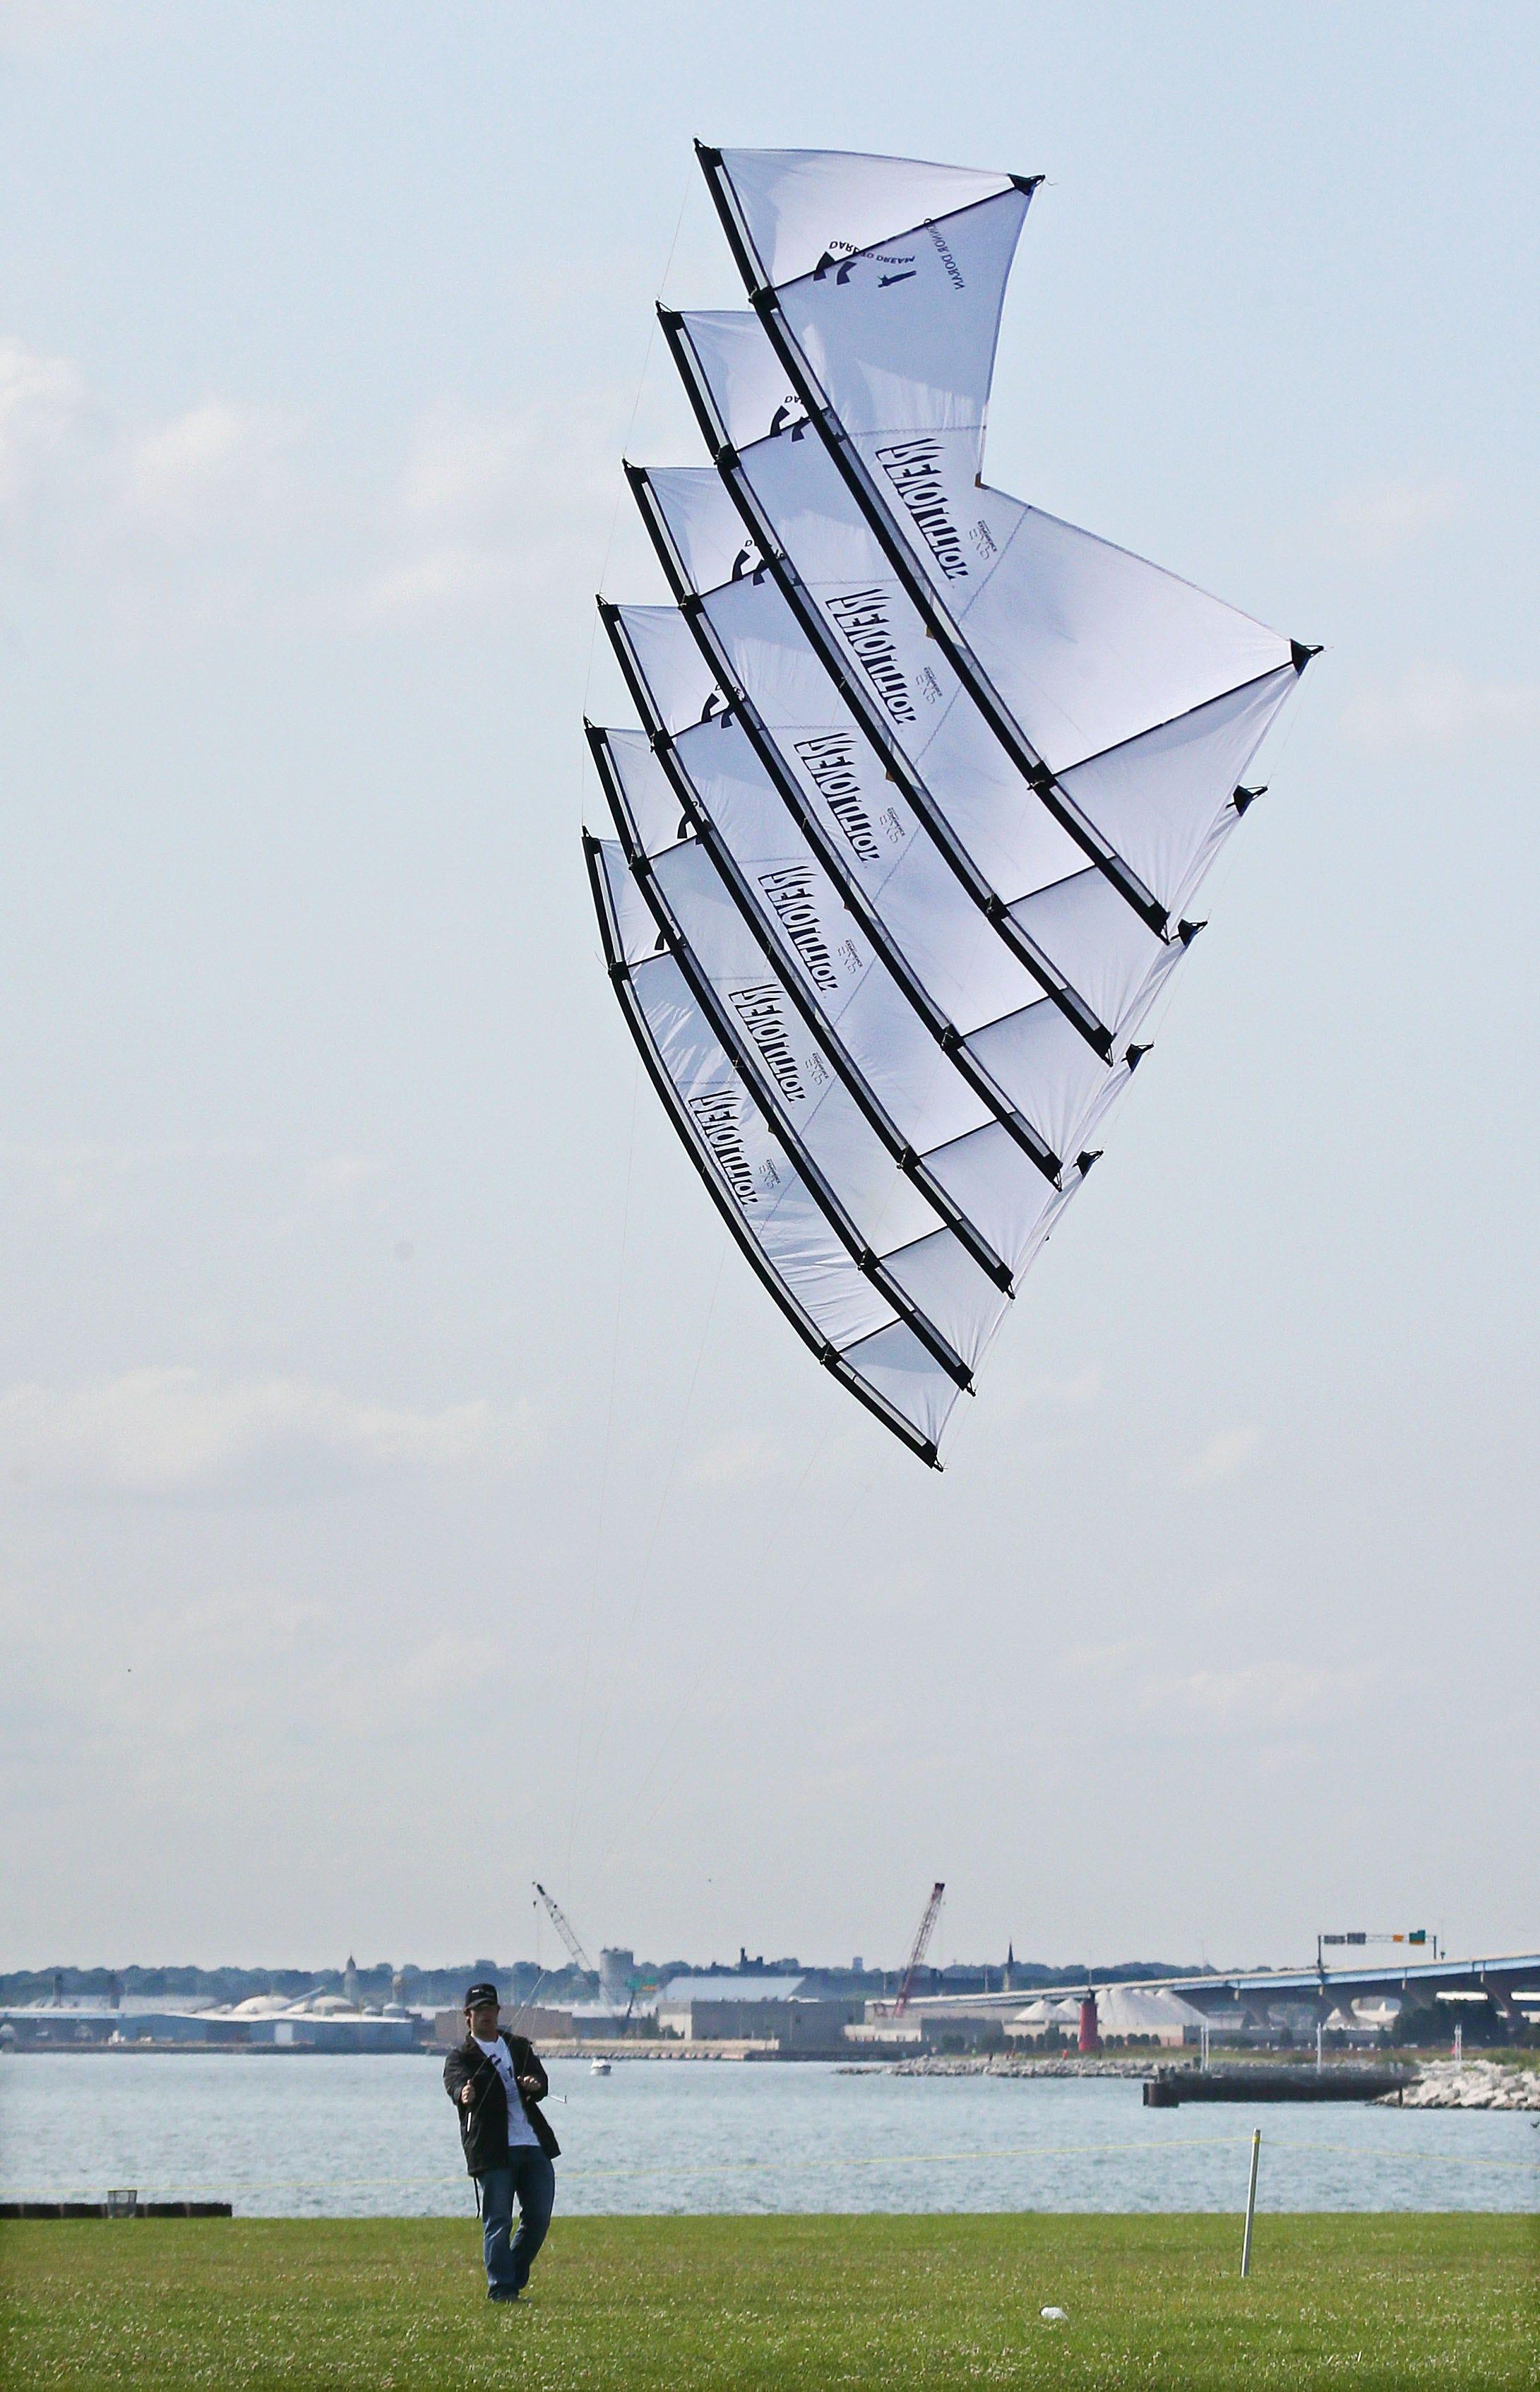 Frank Mots International Kites Festival